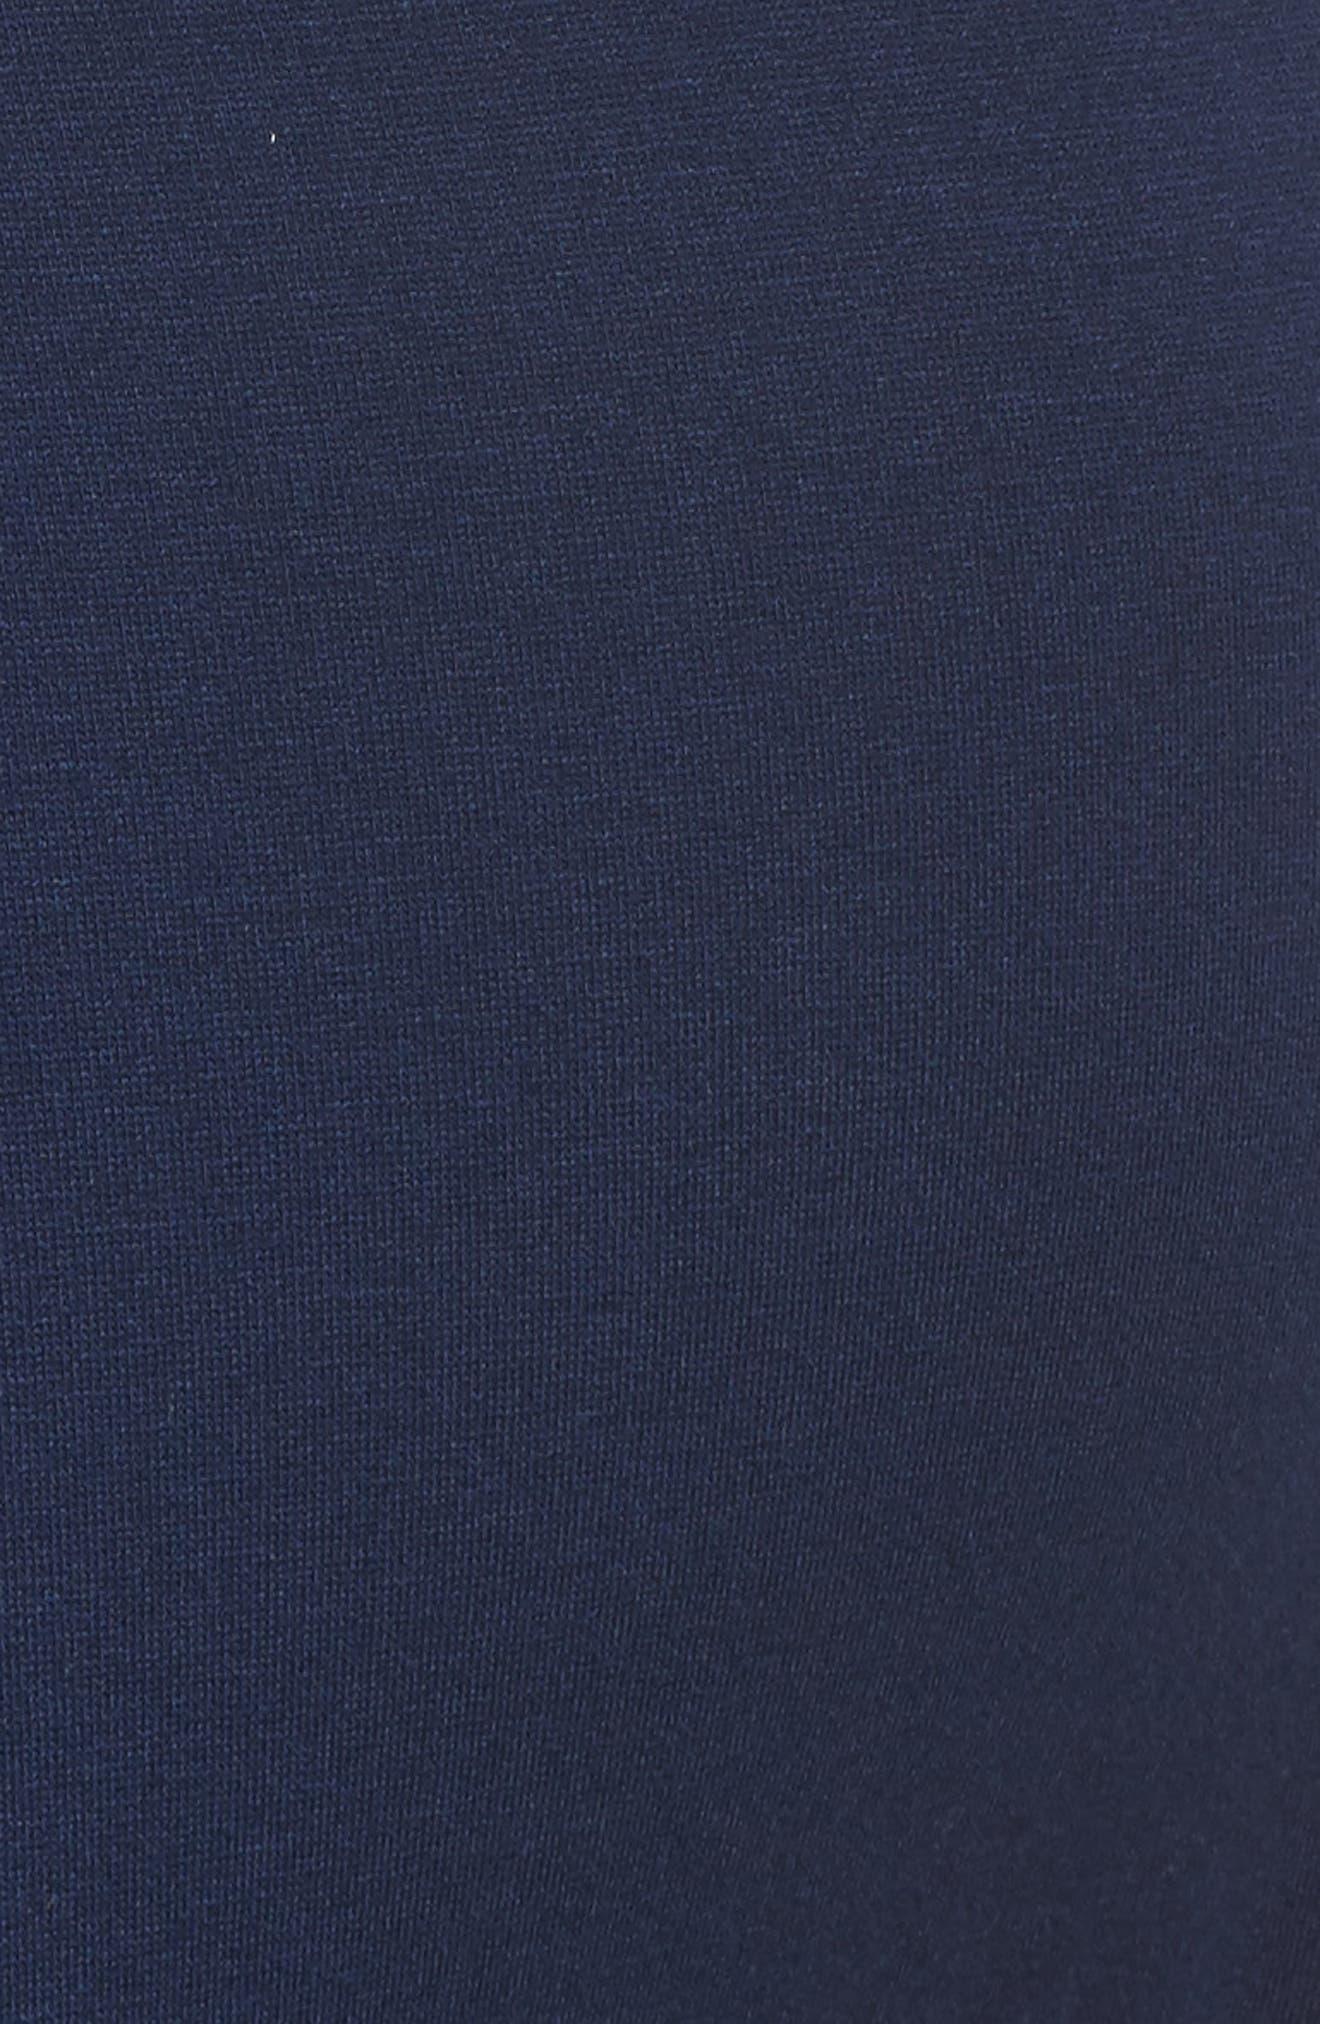 'Tallulah' Maternity Jersey Robe,                             Alternate thumbnail 6, color,